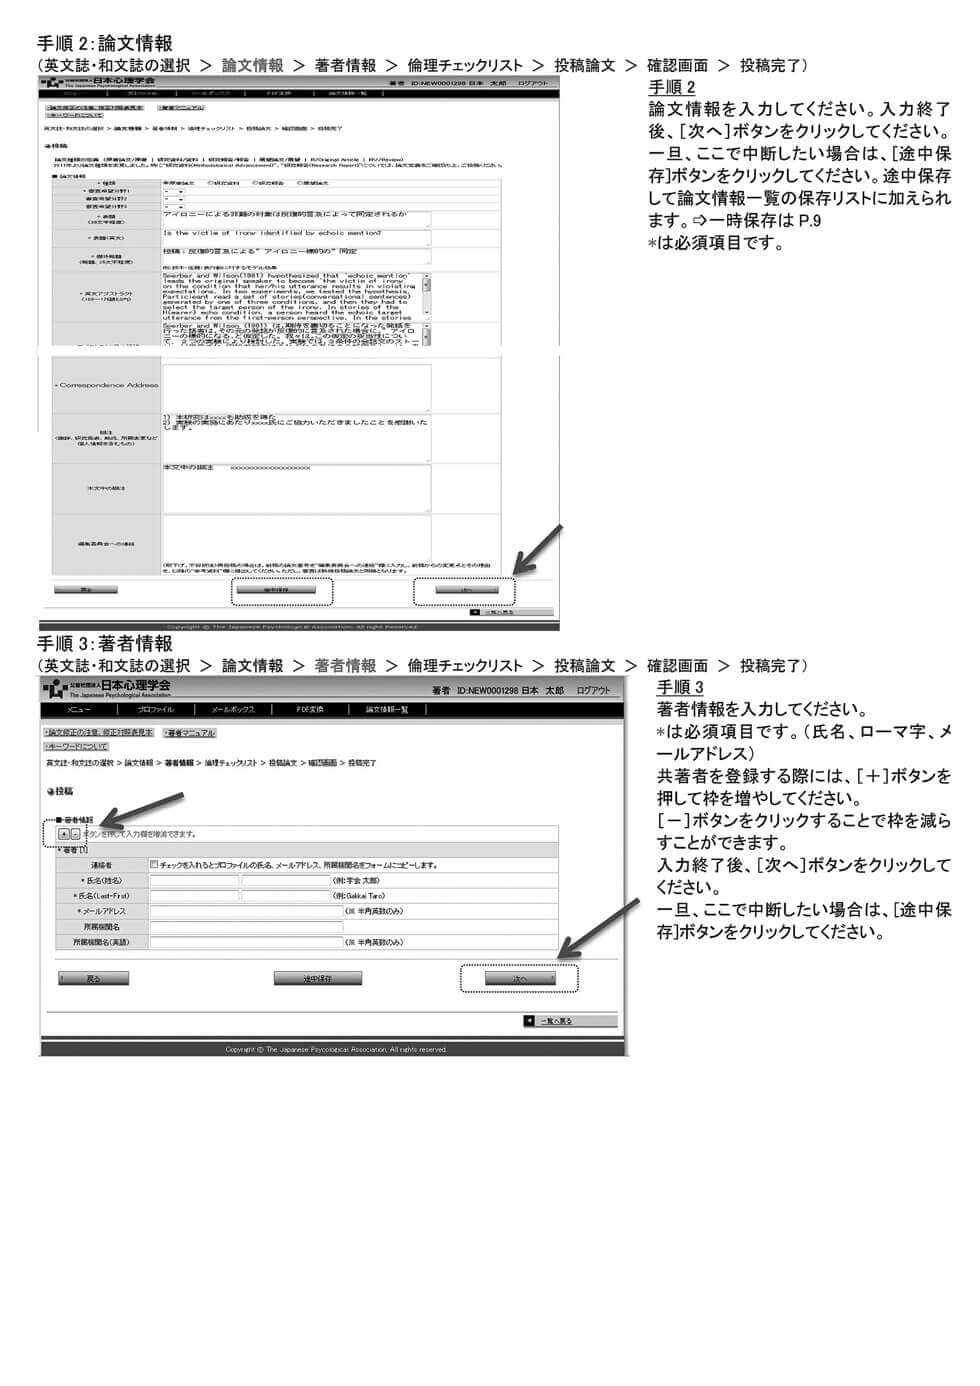 見本2.2 電子投稿システム 論文情報,著者情報入力画面